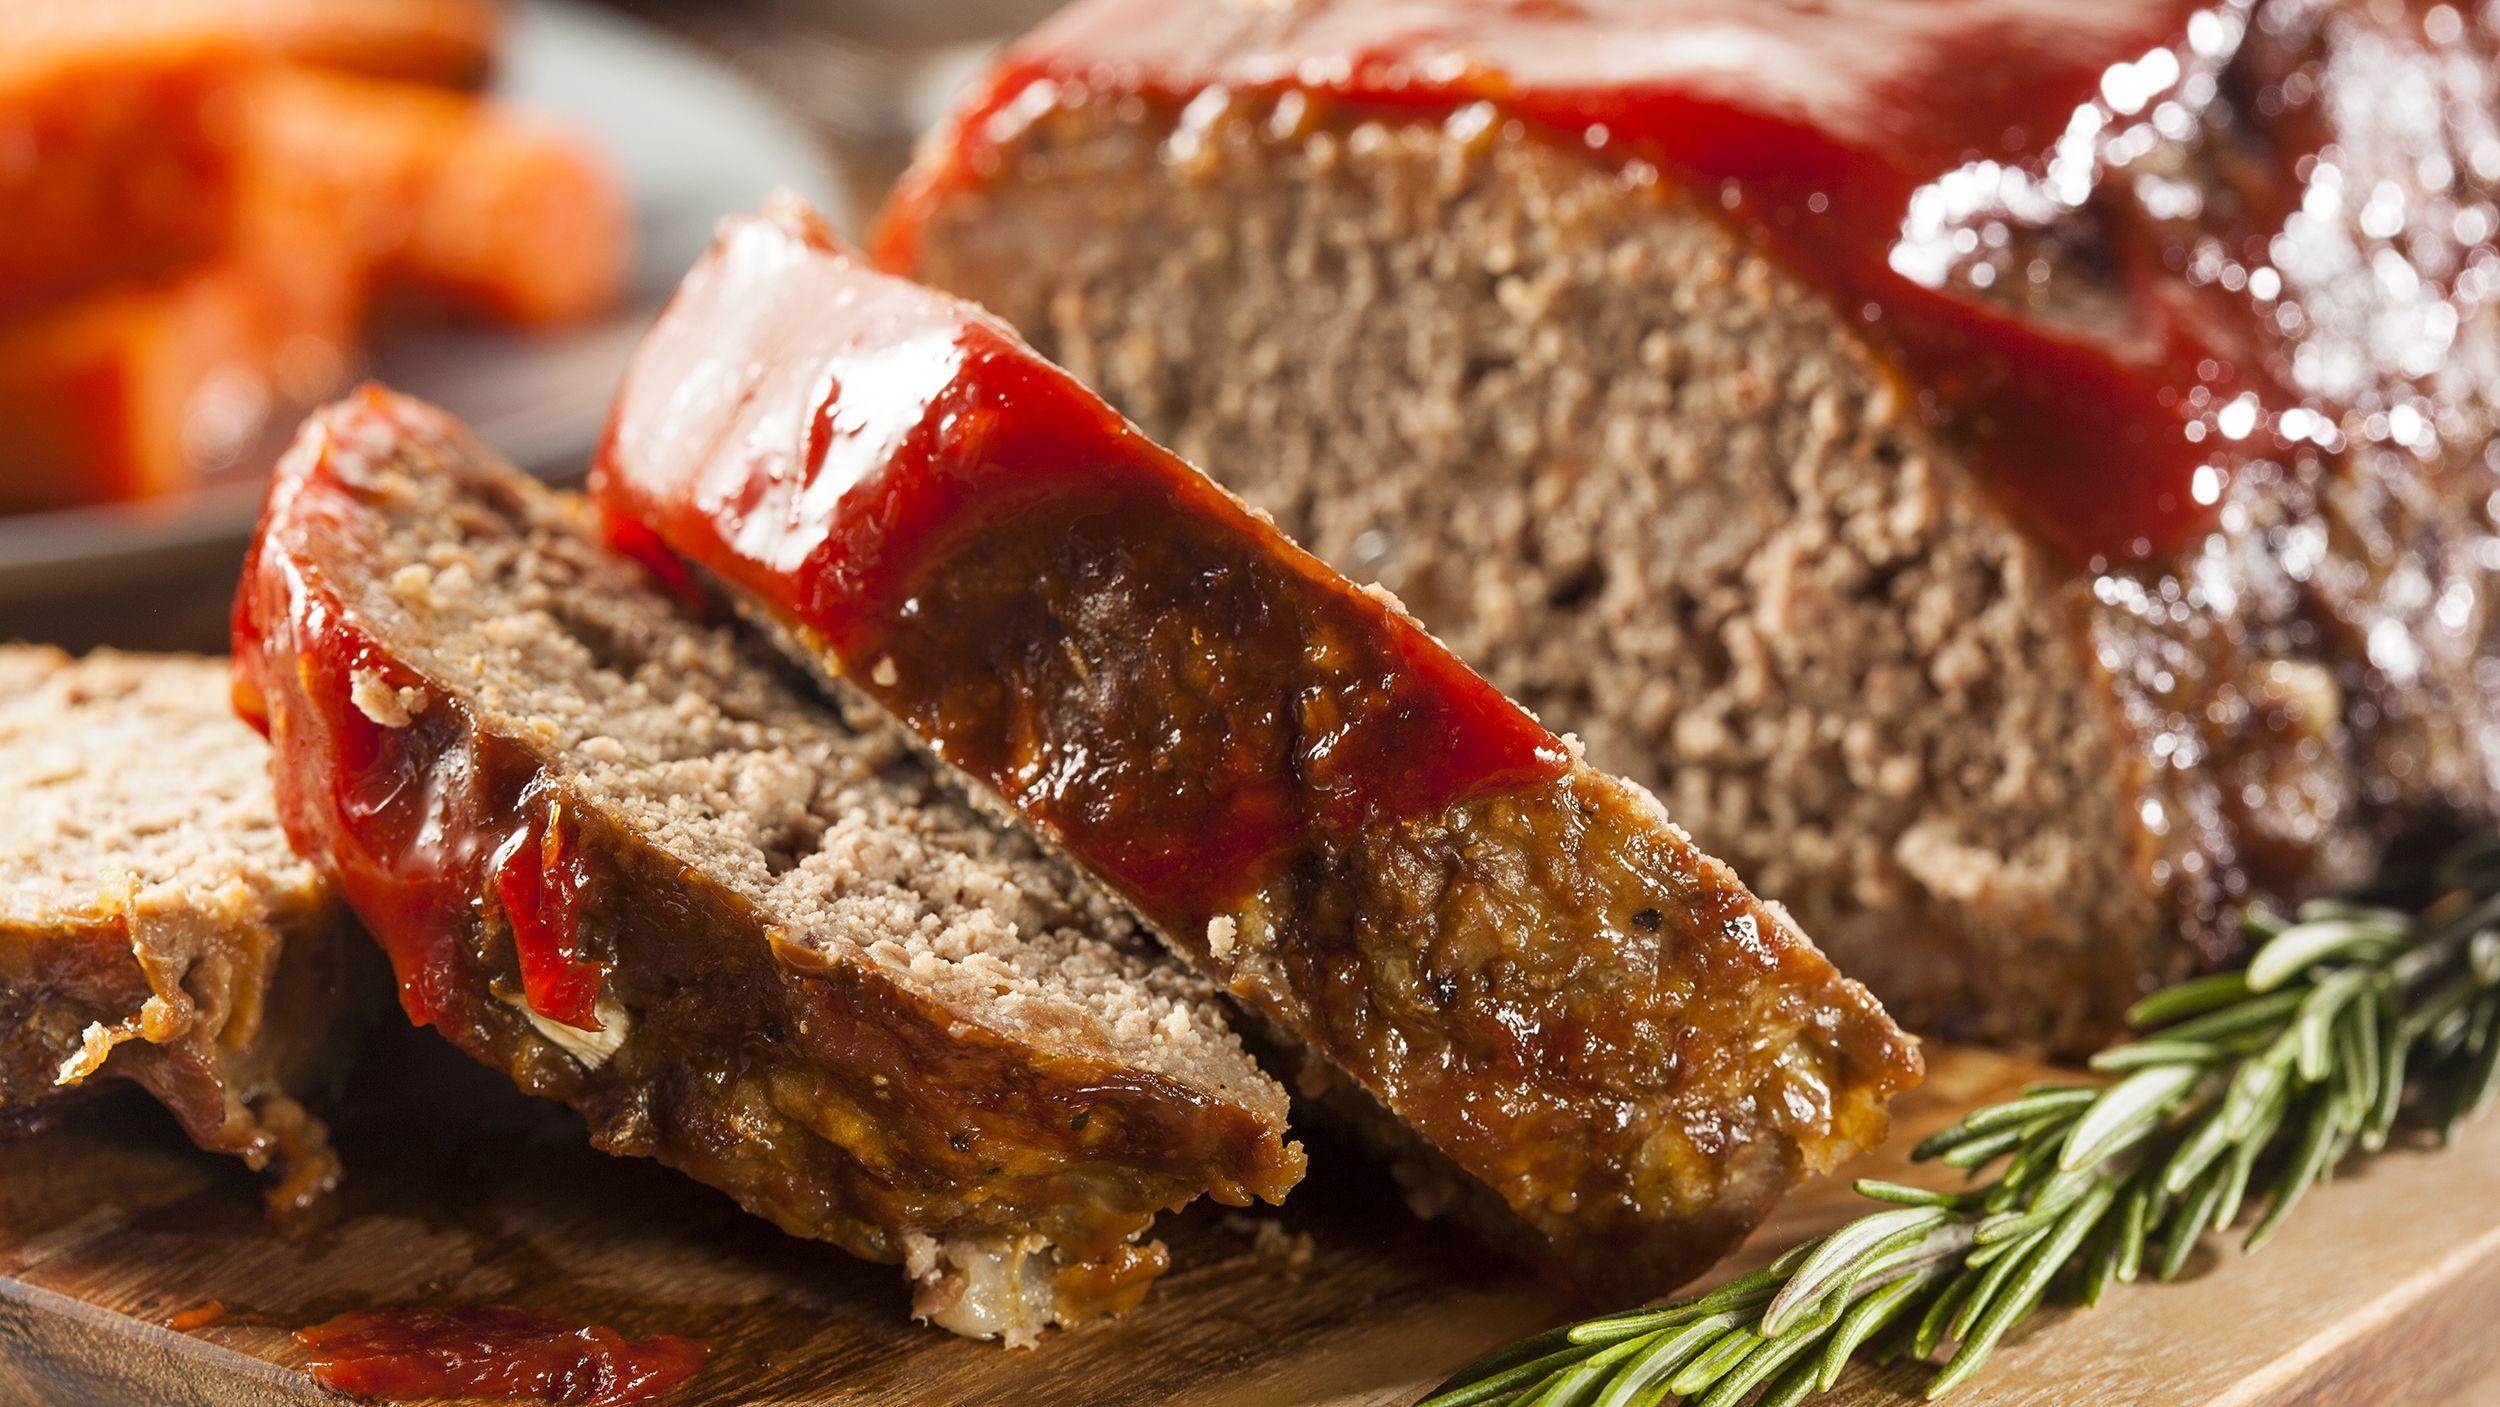 Dr Oz S Meatier Meatloaf Uses A Secret Healthy Ingredient For Moisture Recipe Homemade Meatloaf Good Meatloaf Recipe Recipes